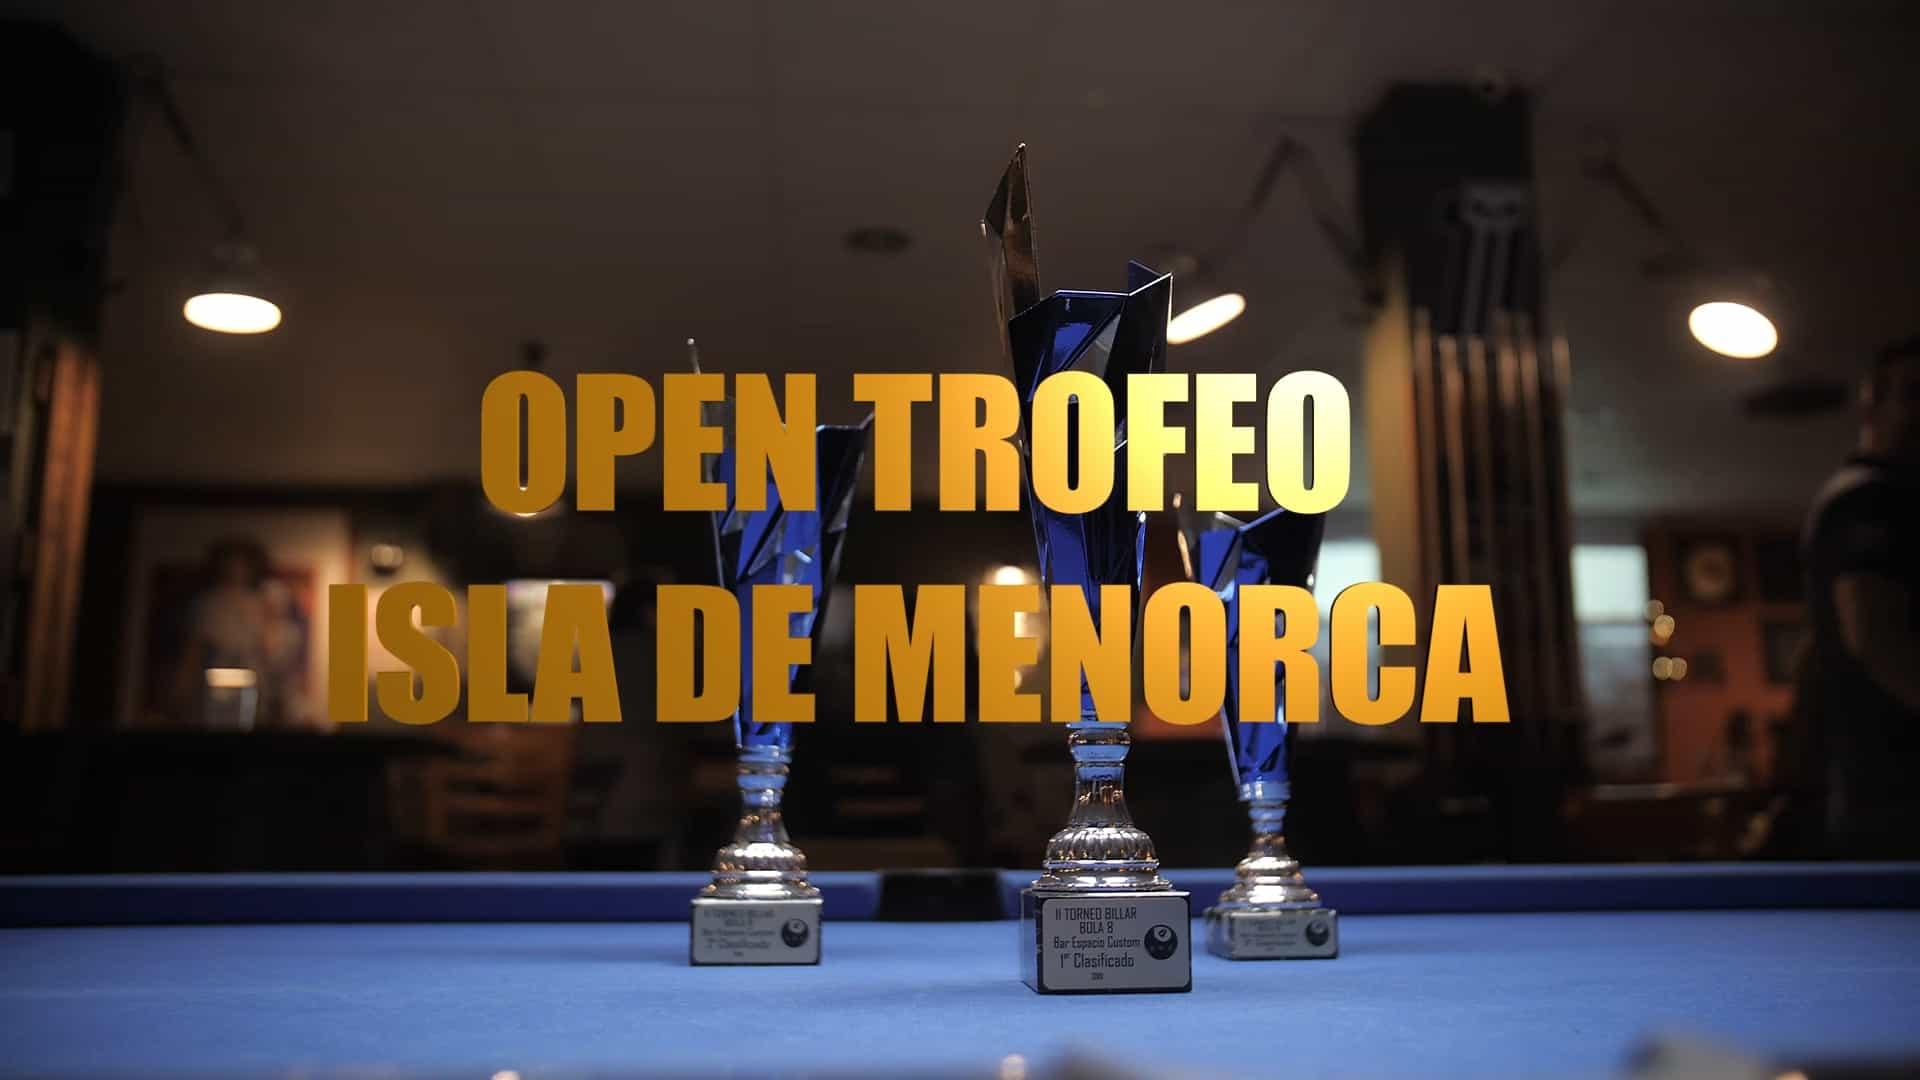 Open Trofeo Isla Menorca